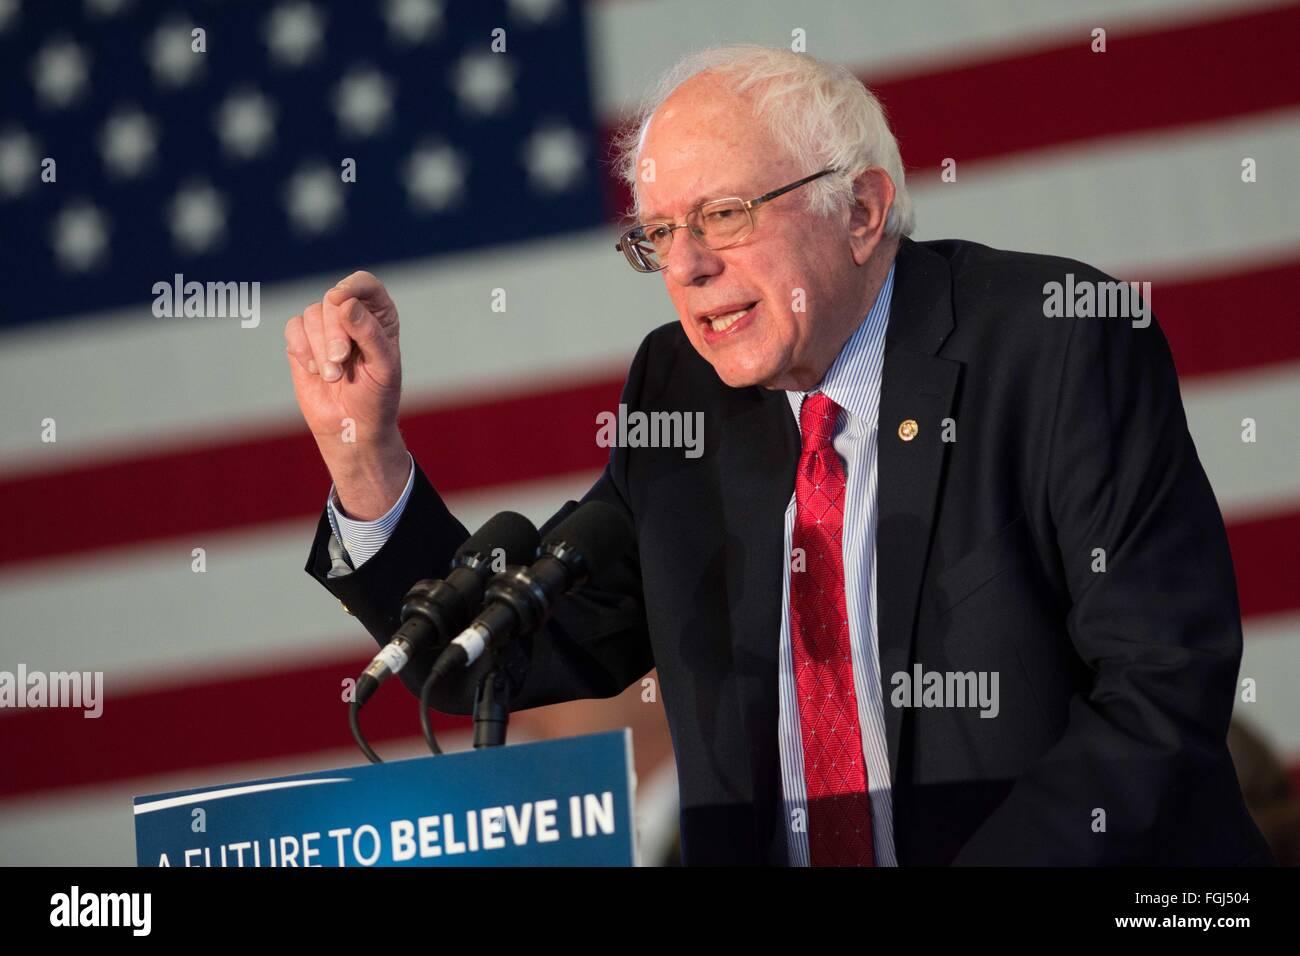 Elko, Nevada, USA. 19th Feb, 2016. Democratic presidential candidate Sen. BERNIE SANDERS (D-VT) speaks at a campaign - Stock Image